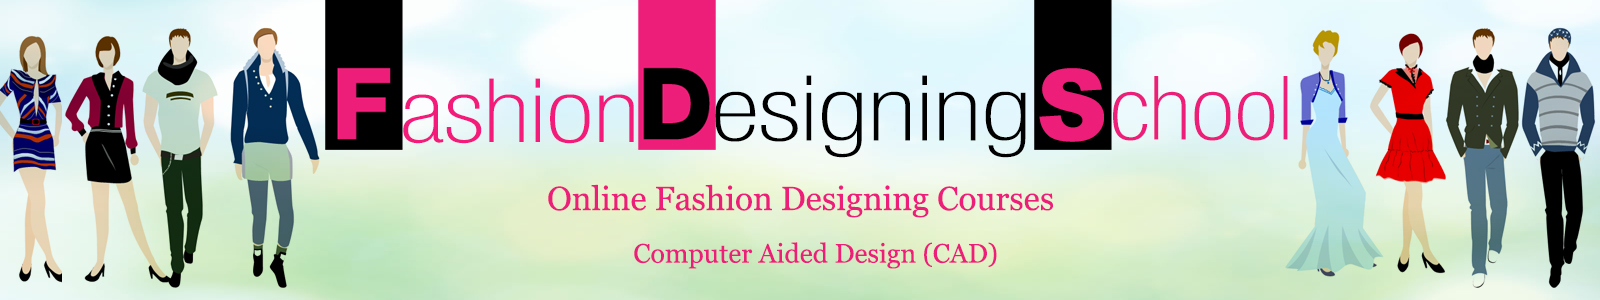 fashion designing courses online, online fashion designing course, cad textile design course